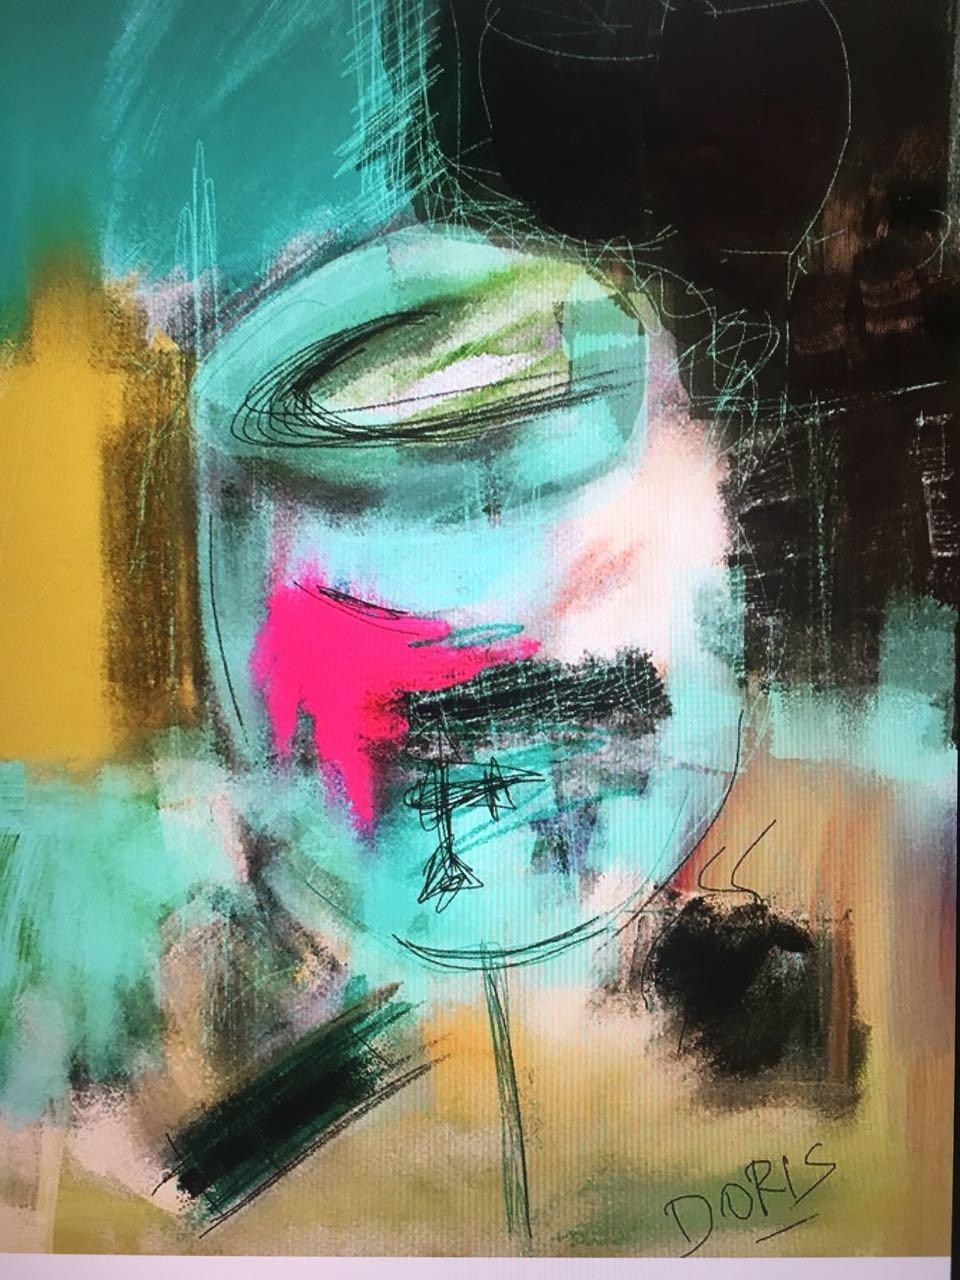 Taça Preço Ps medida certa, 2018   Arte digital   40 x 50 cm   R$ 500